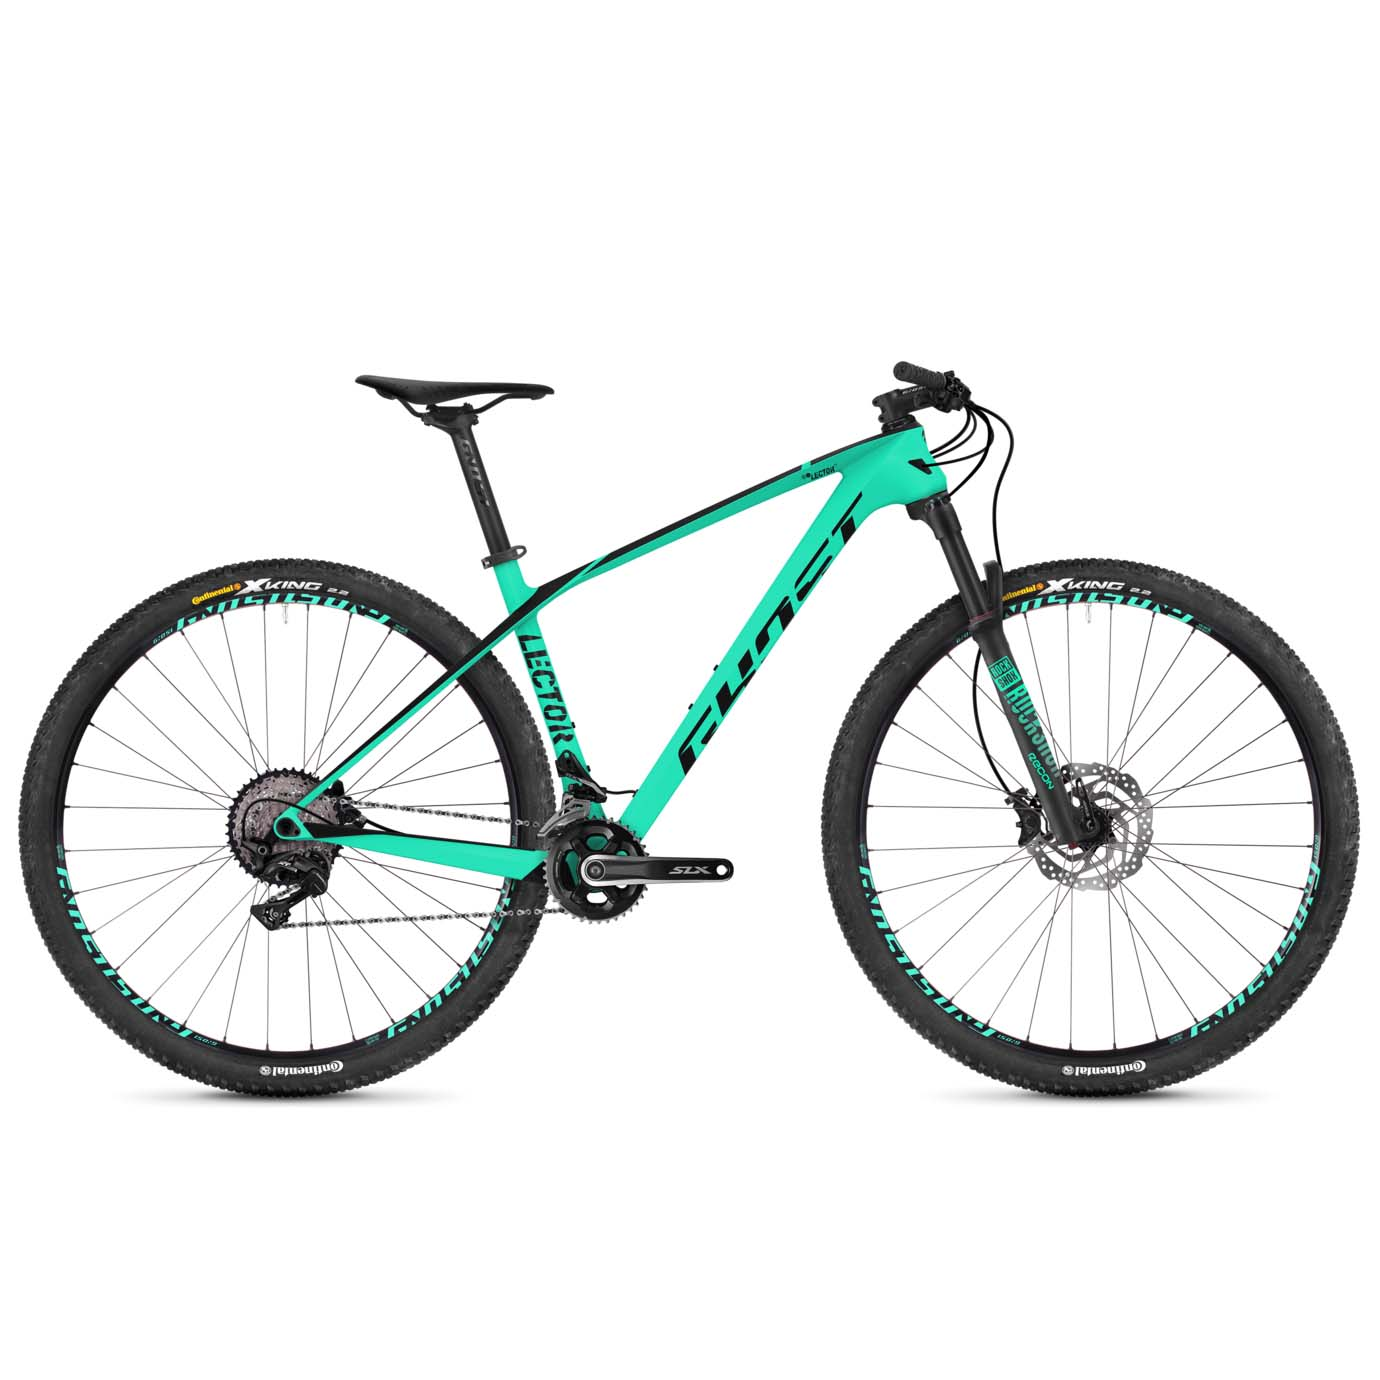 Фото Велосипед Ghost Lector 2.9 29″ , карбон,  рама, L 2019